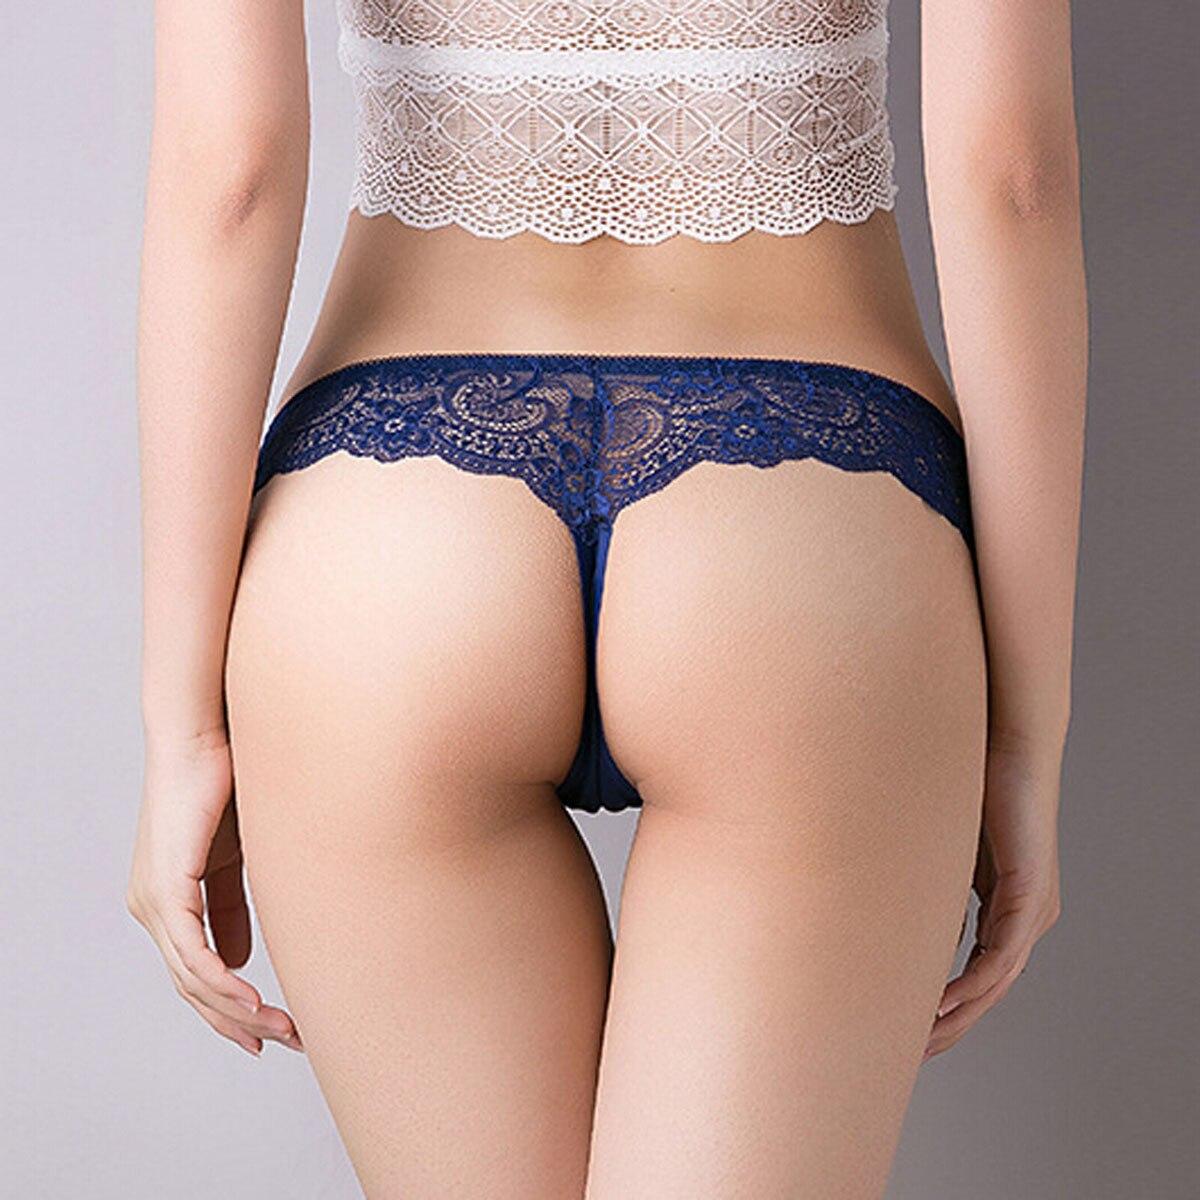 Meihuida Women wife lace leaves Women's Sexy lingerie Thongs G-string Underwear Panties Briefs Ladies T-back 1pcs/Lot